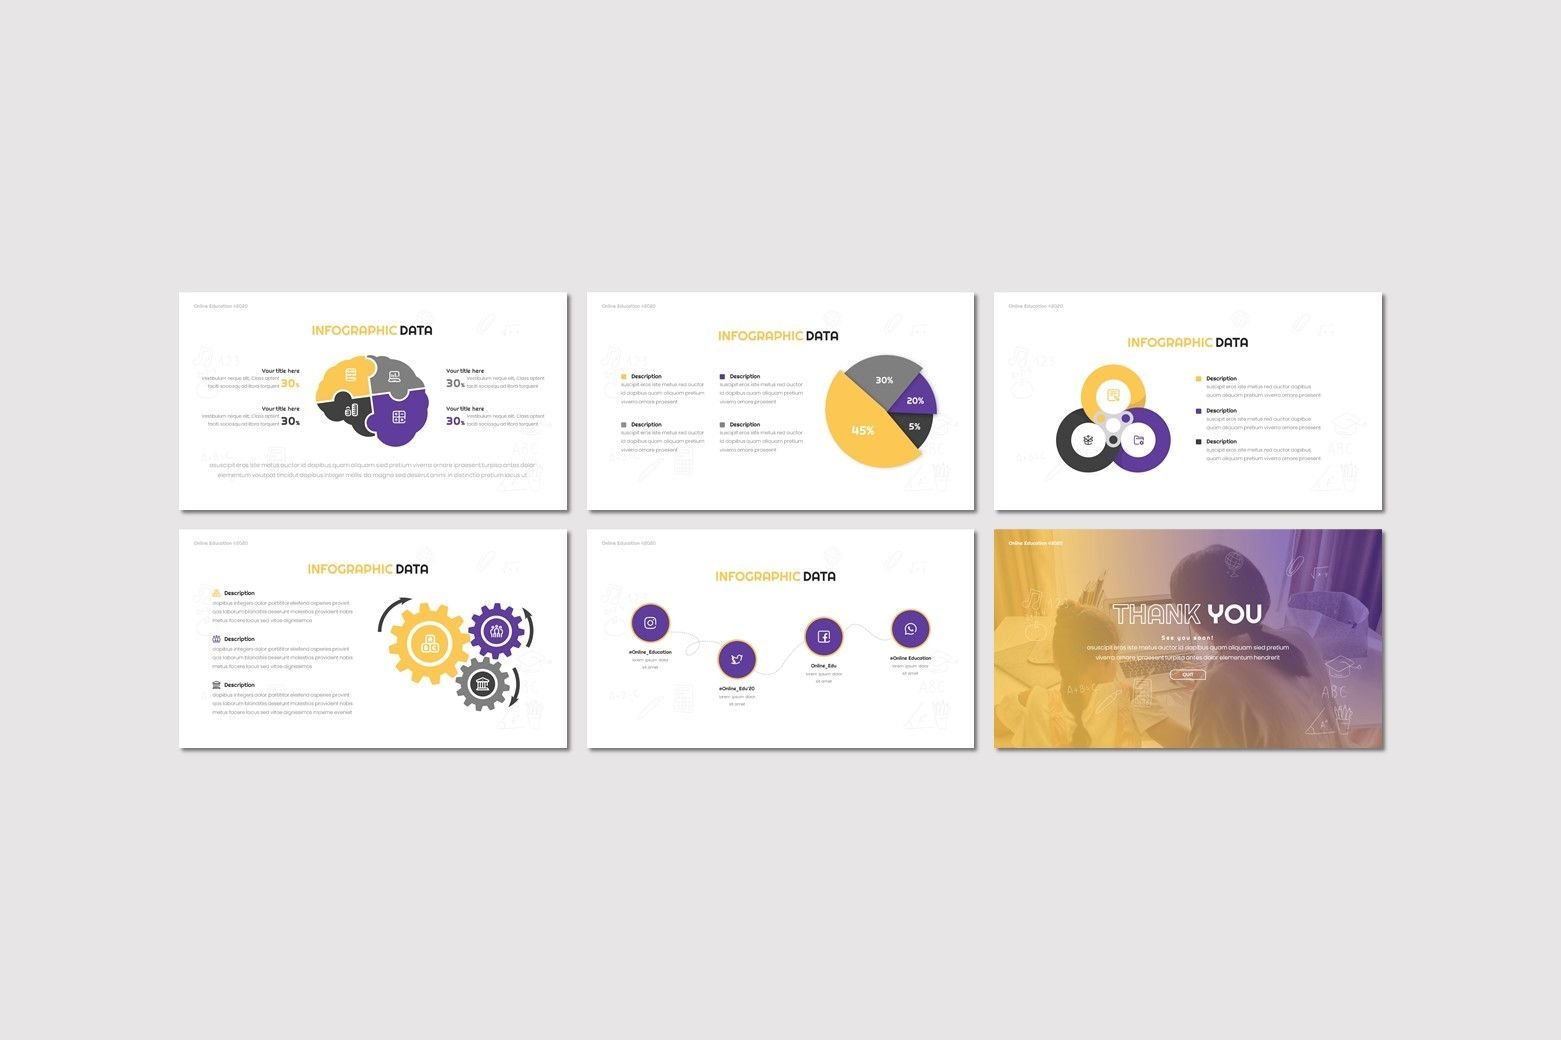 Online Education - Google Slides Template, Slide 4, 08047, Presentation Templates — PoweredTemplate.com